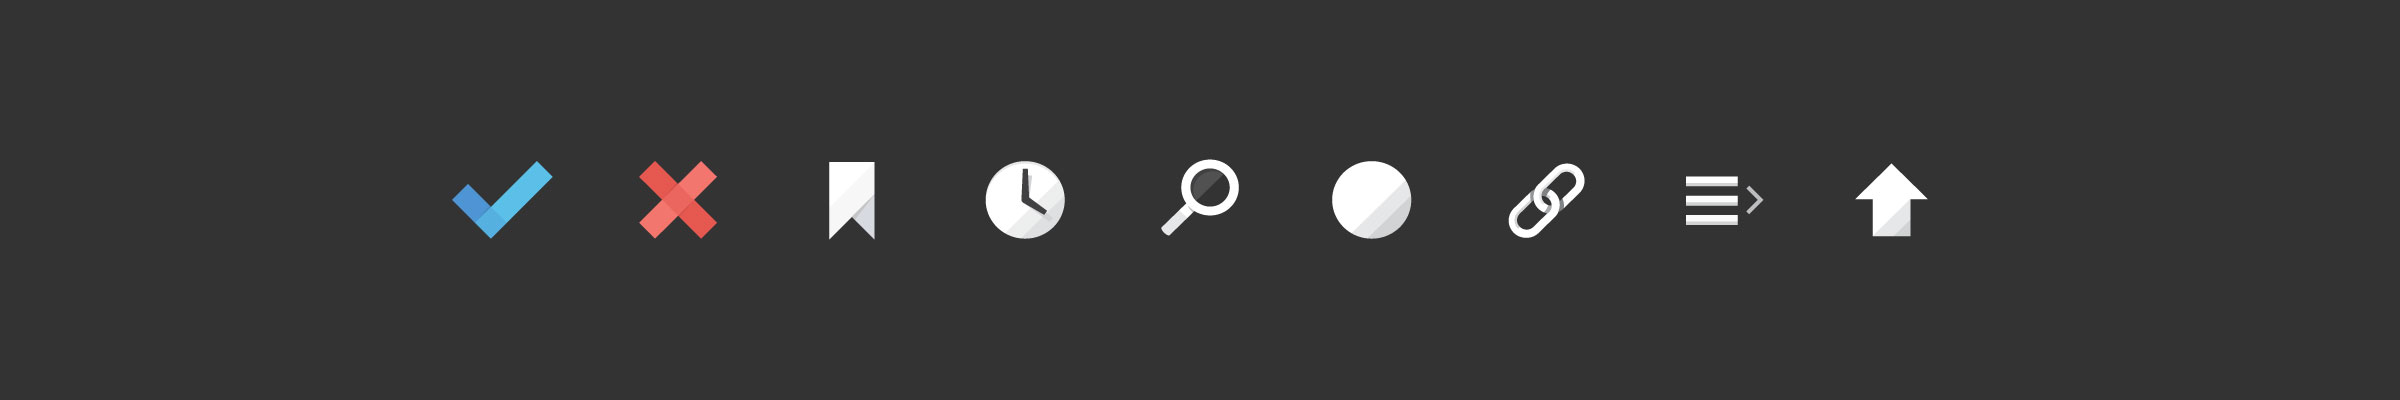 Image Unmark UI Icons